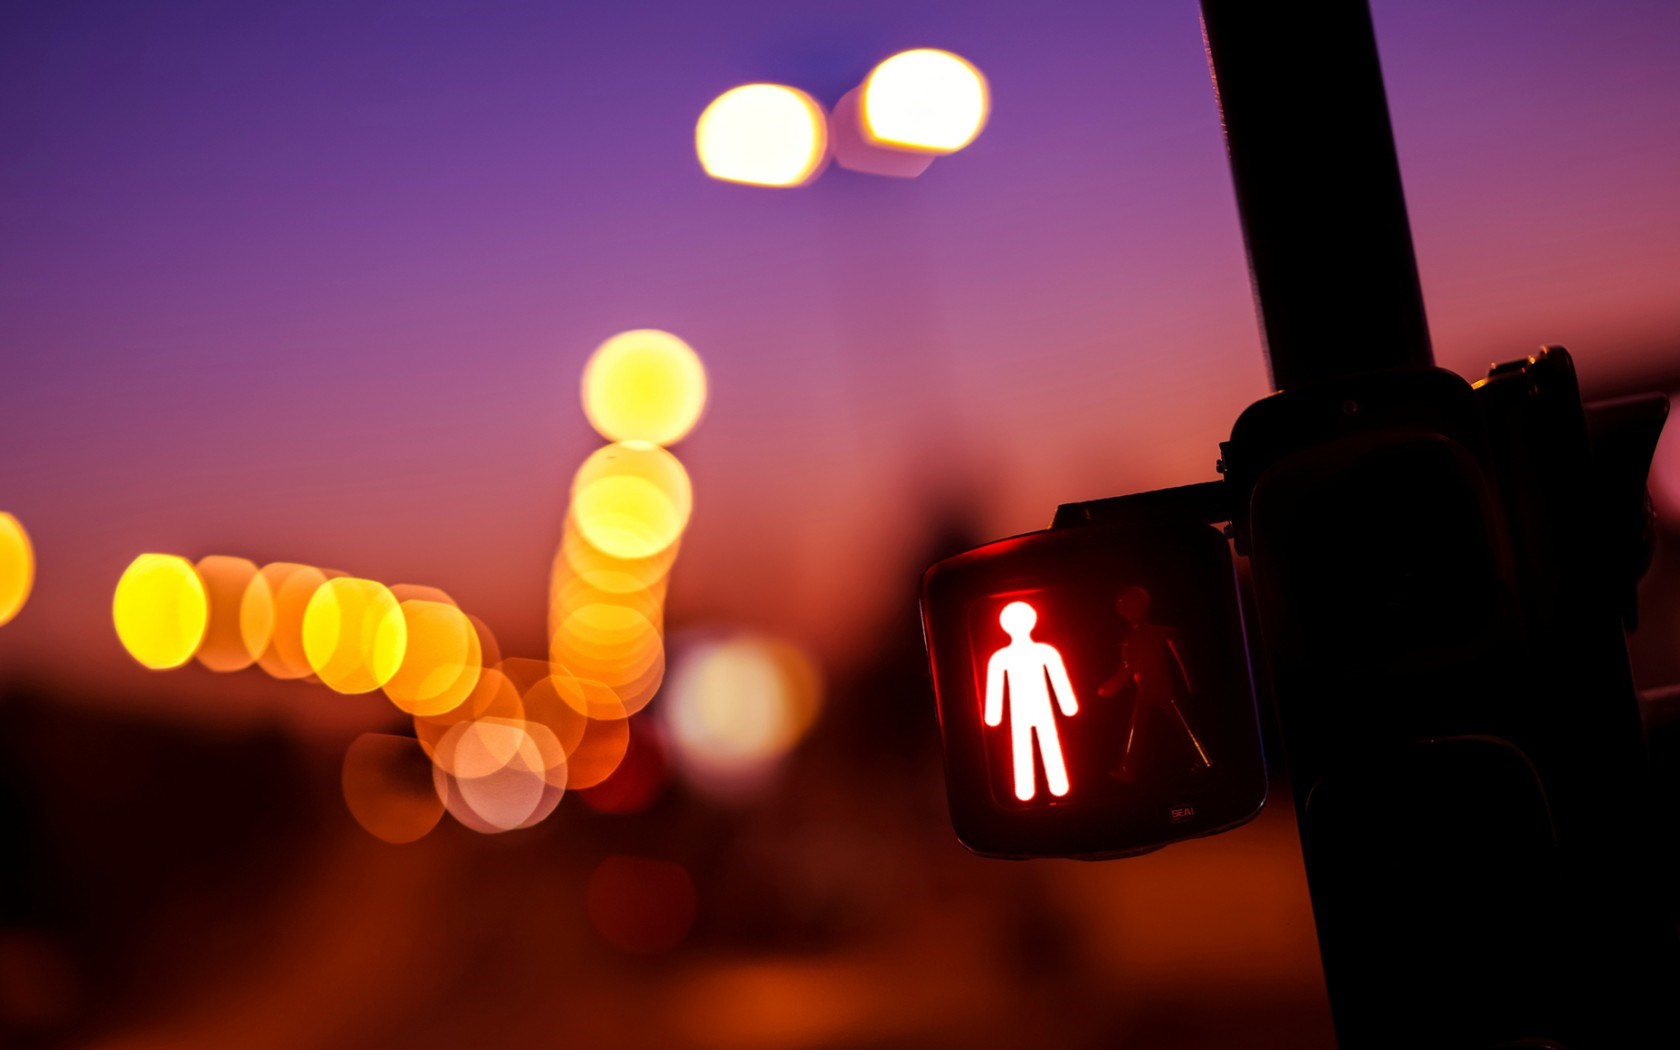 Download Traffic Light 35194 1680x1050 Px High Resolution Wallpaper